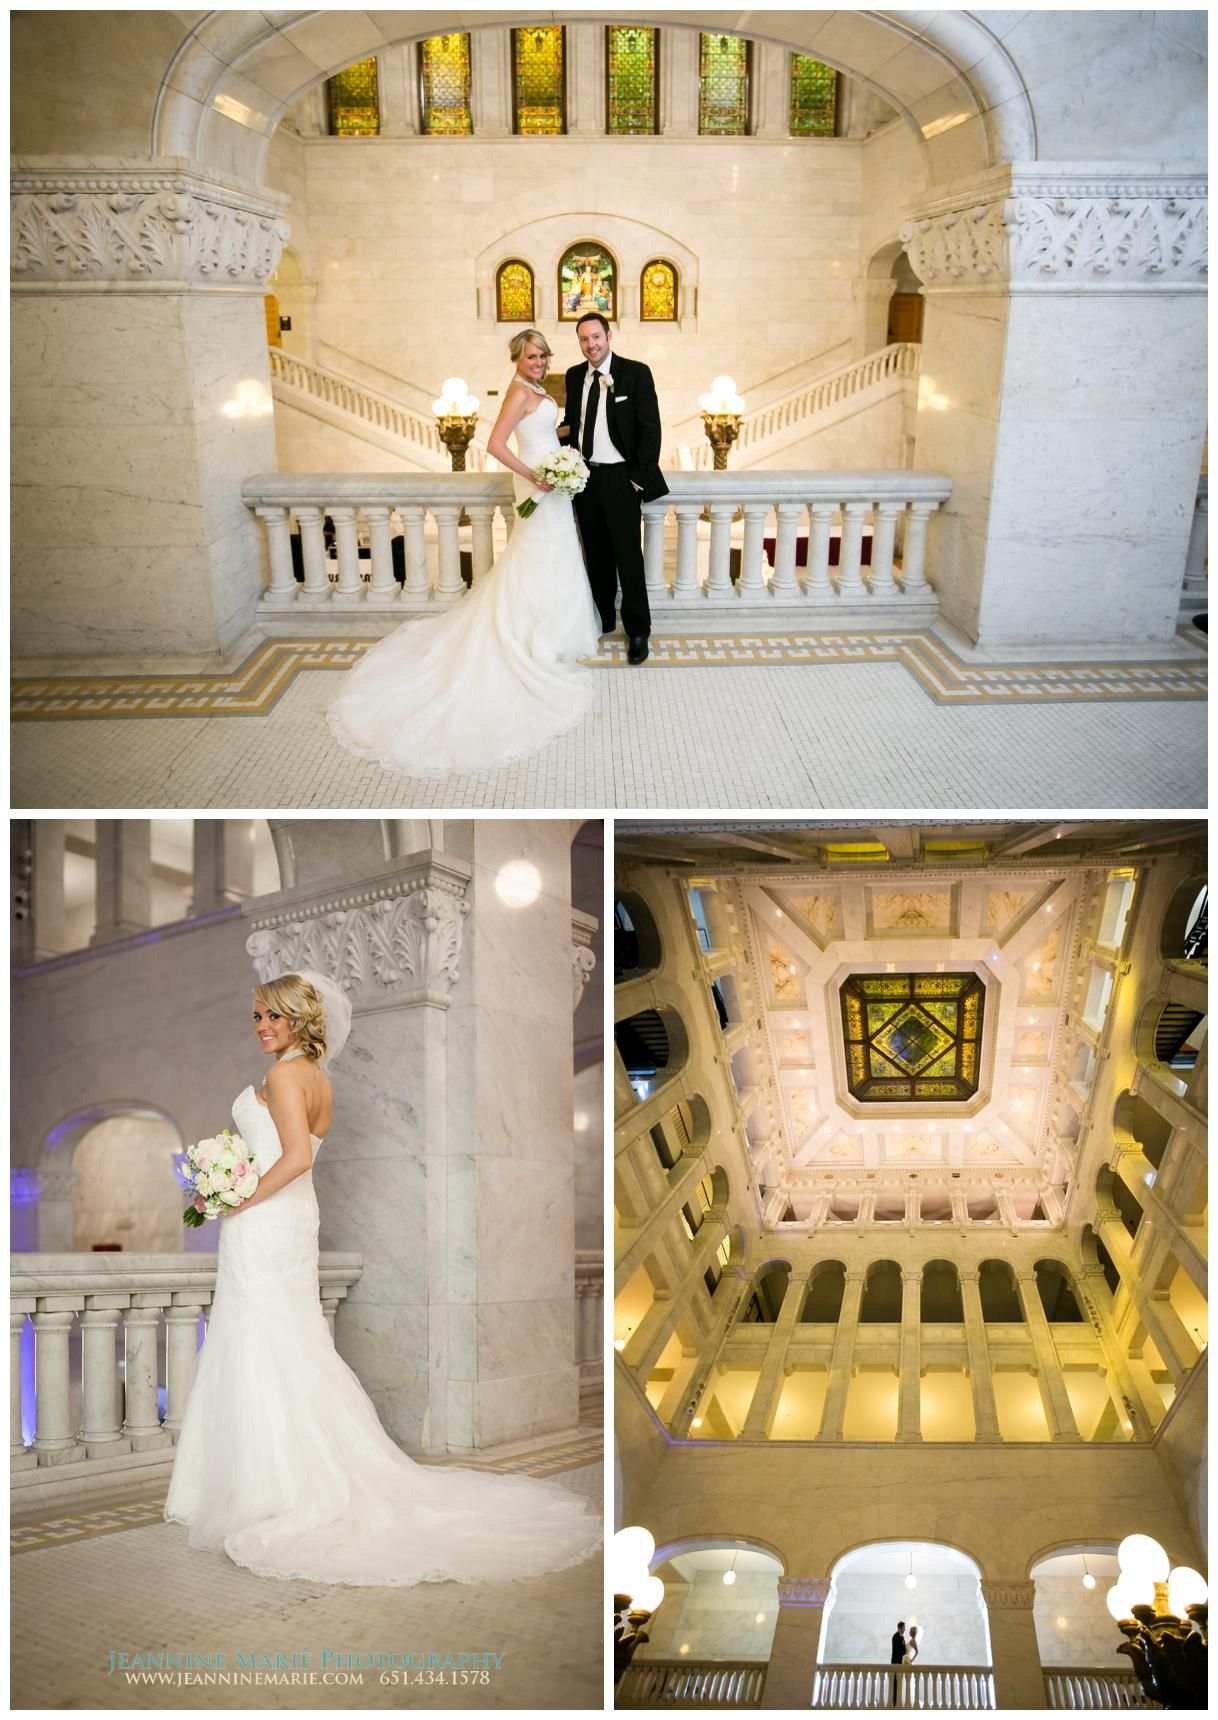 Jeanninemarie Jeannine Marie Photography MN Wedding PhotographerMinnesota Weddings